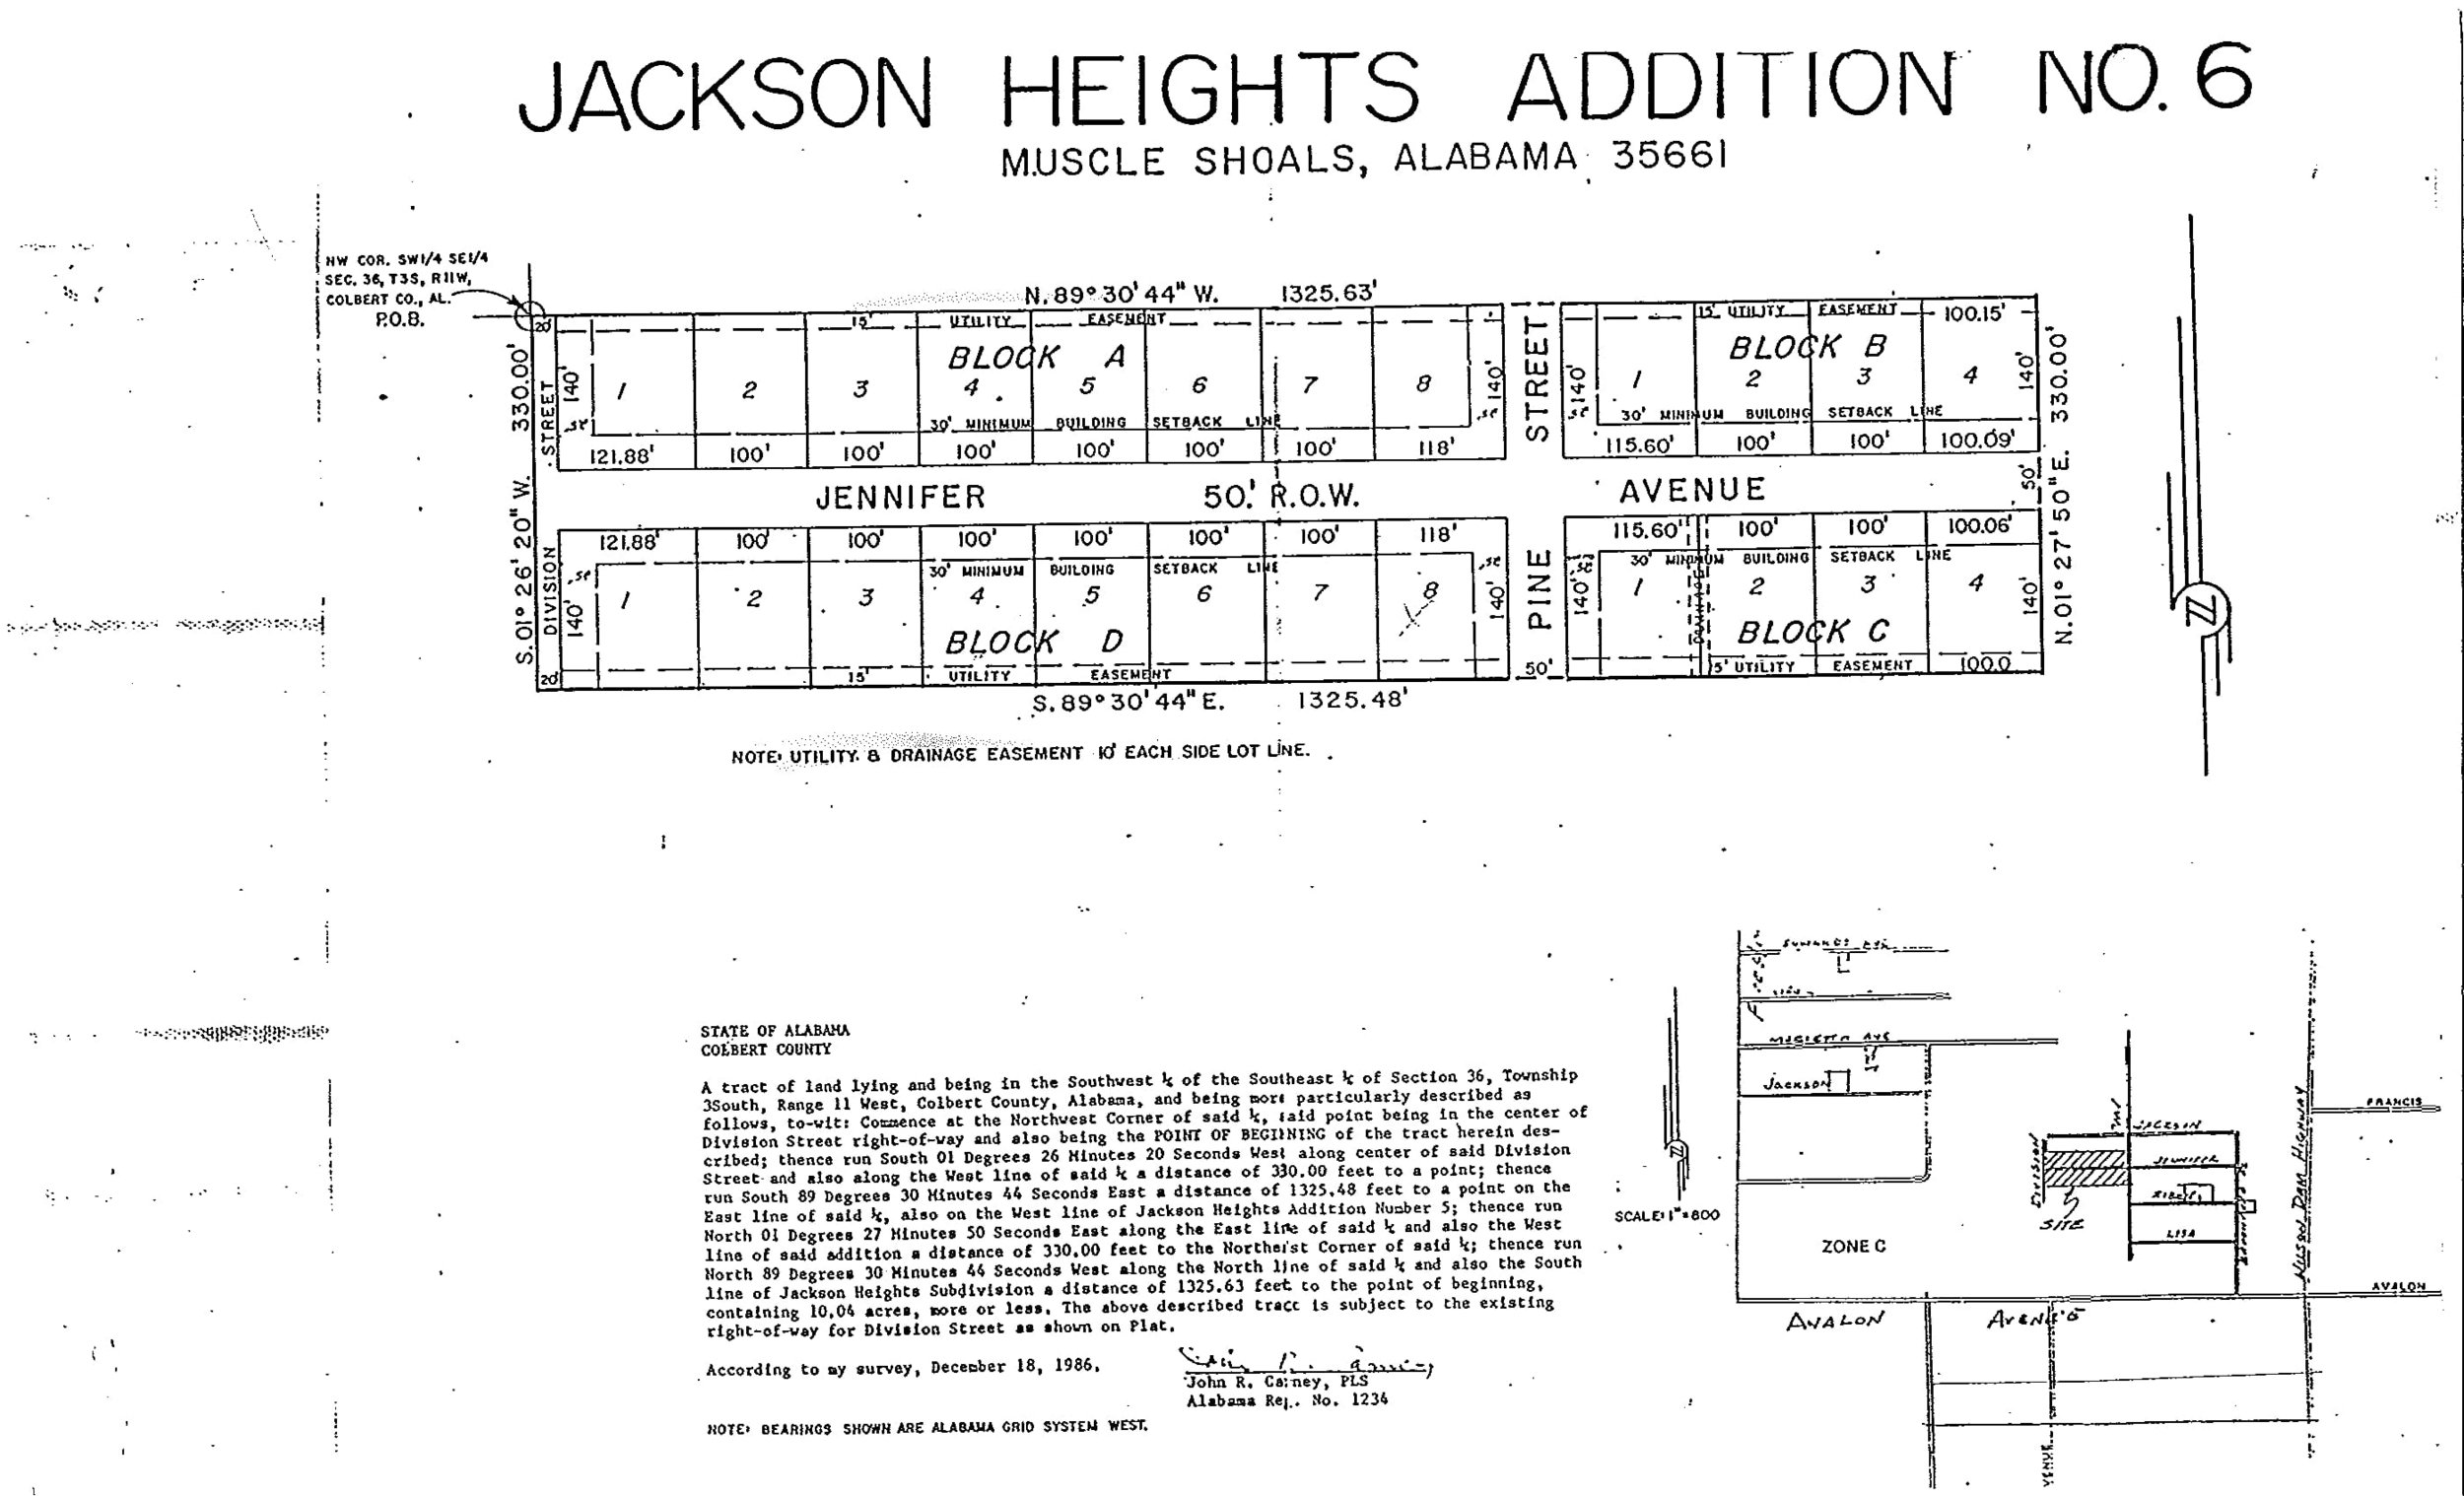 Plat-Jackson-Heights-Addition-No-6-1.jpg